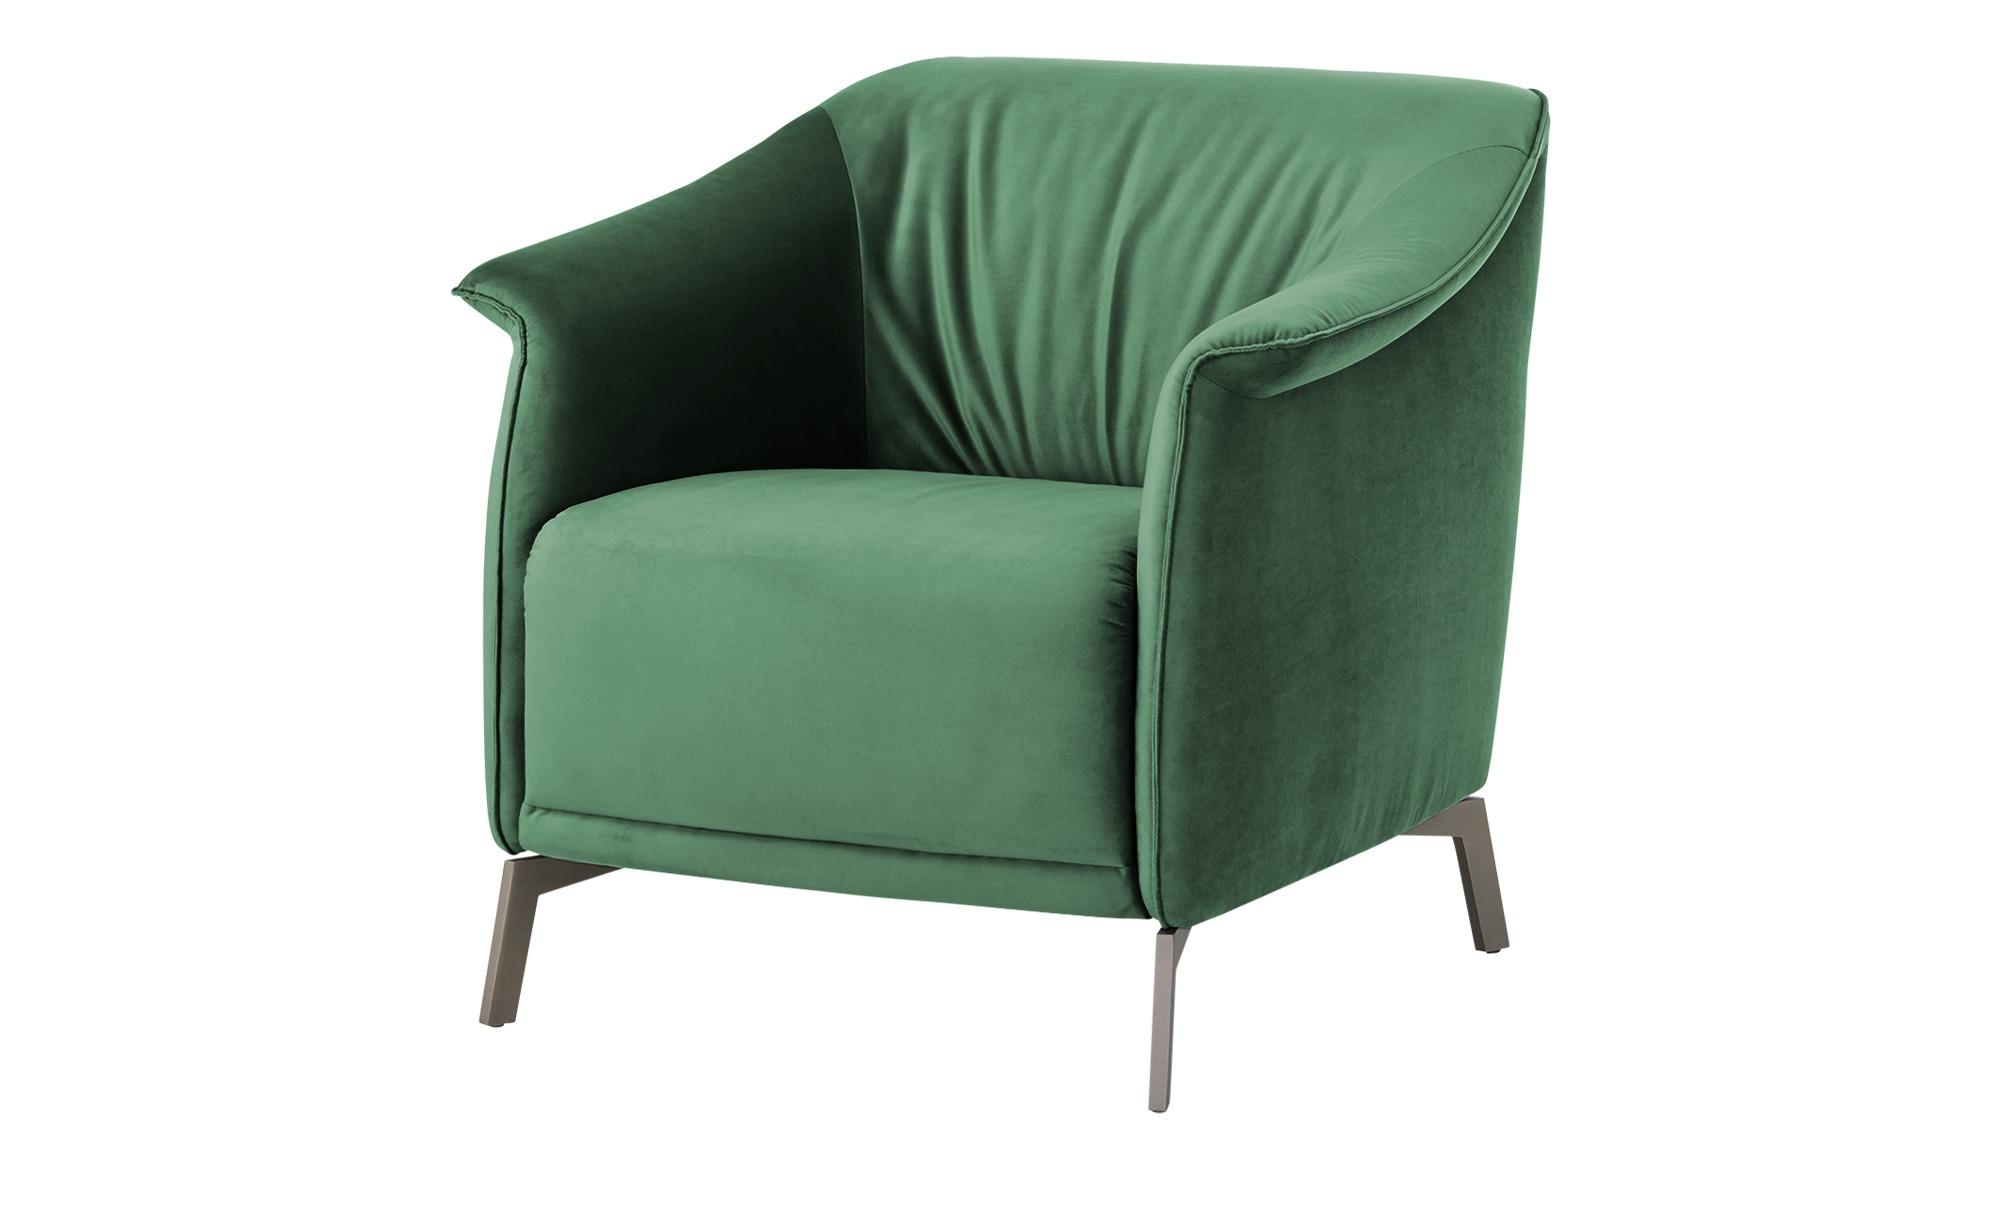 pop Sessel  Lamia ¦ grün ¦ Maße (cm): B: 80 H: 77 T: 83 Polstermöbel > Sessel > Polstersessel - Höffner